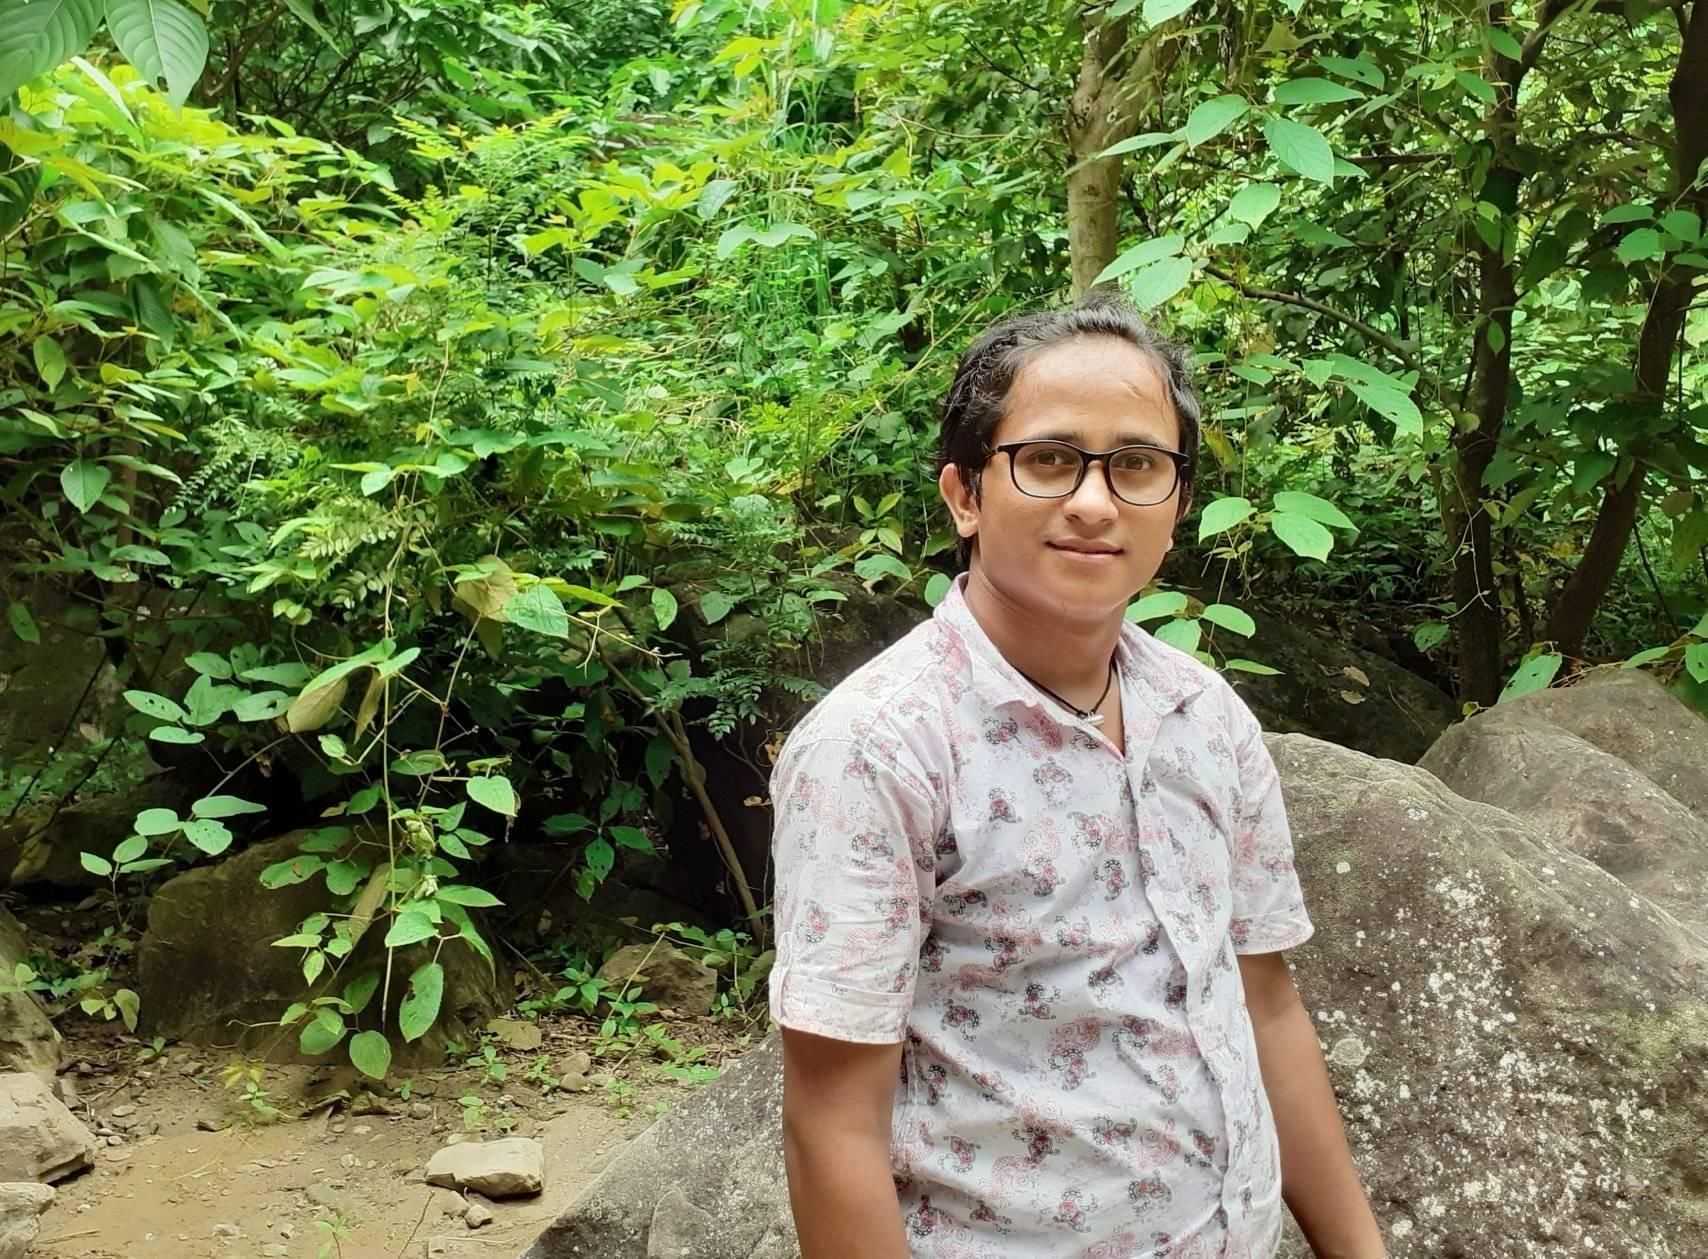 https://www.nepalbodh.com/others/literature/956